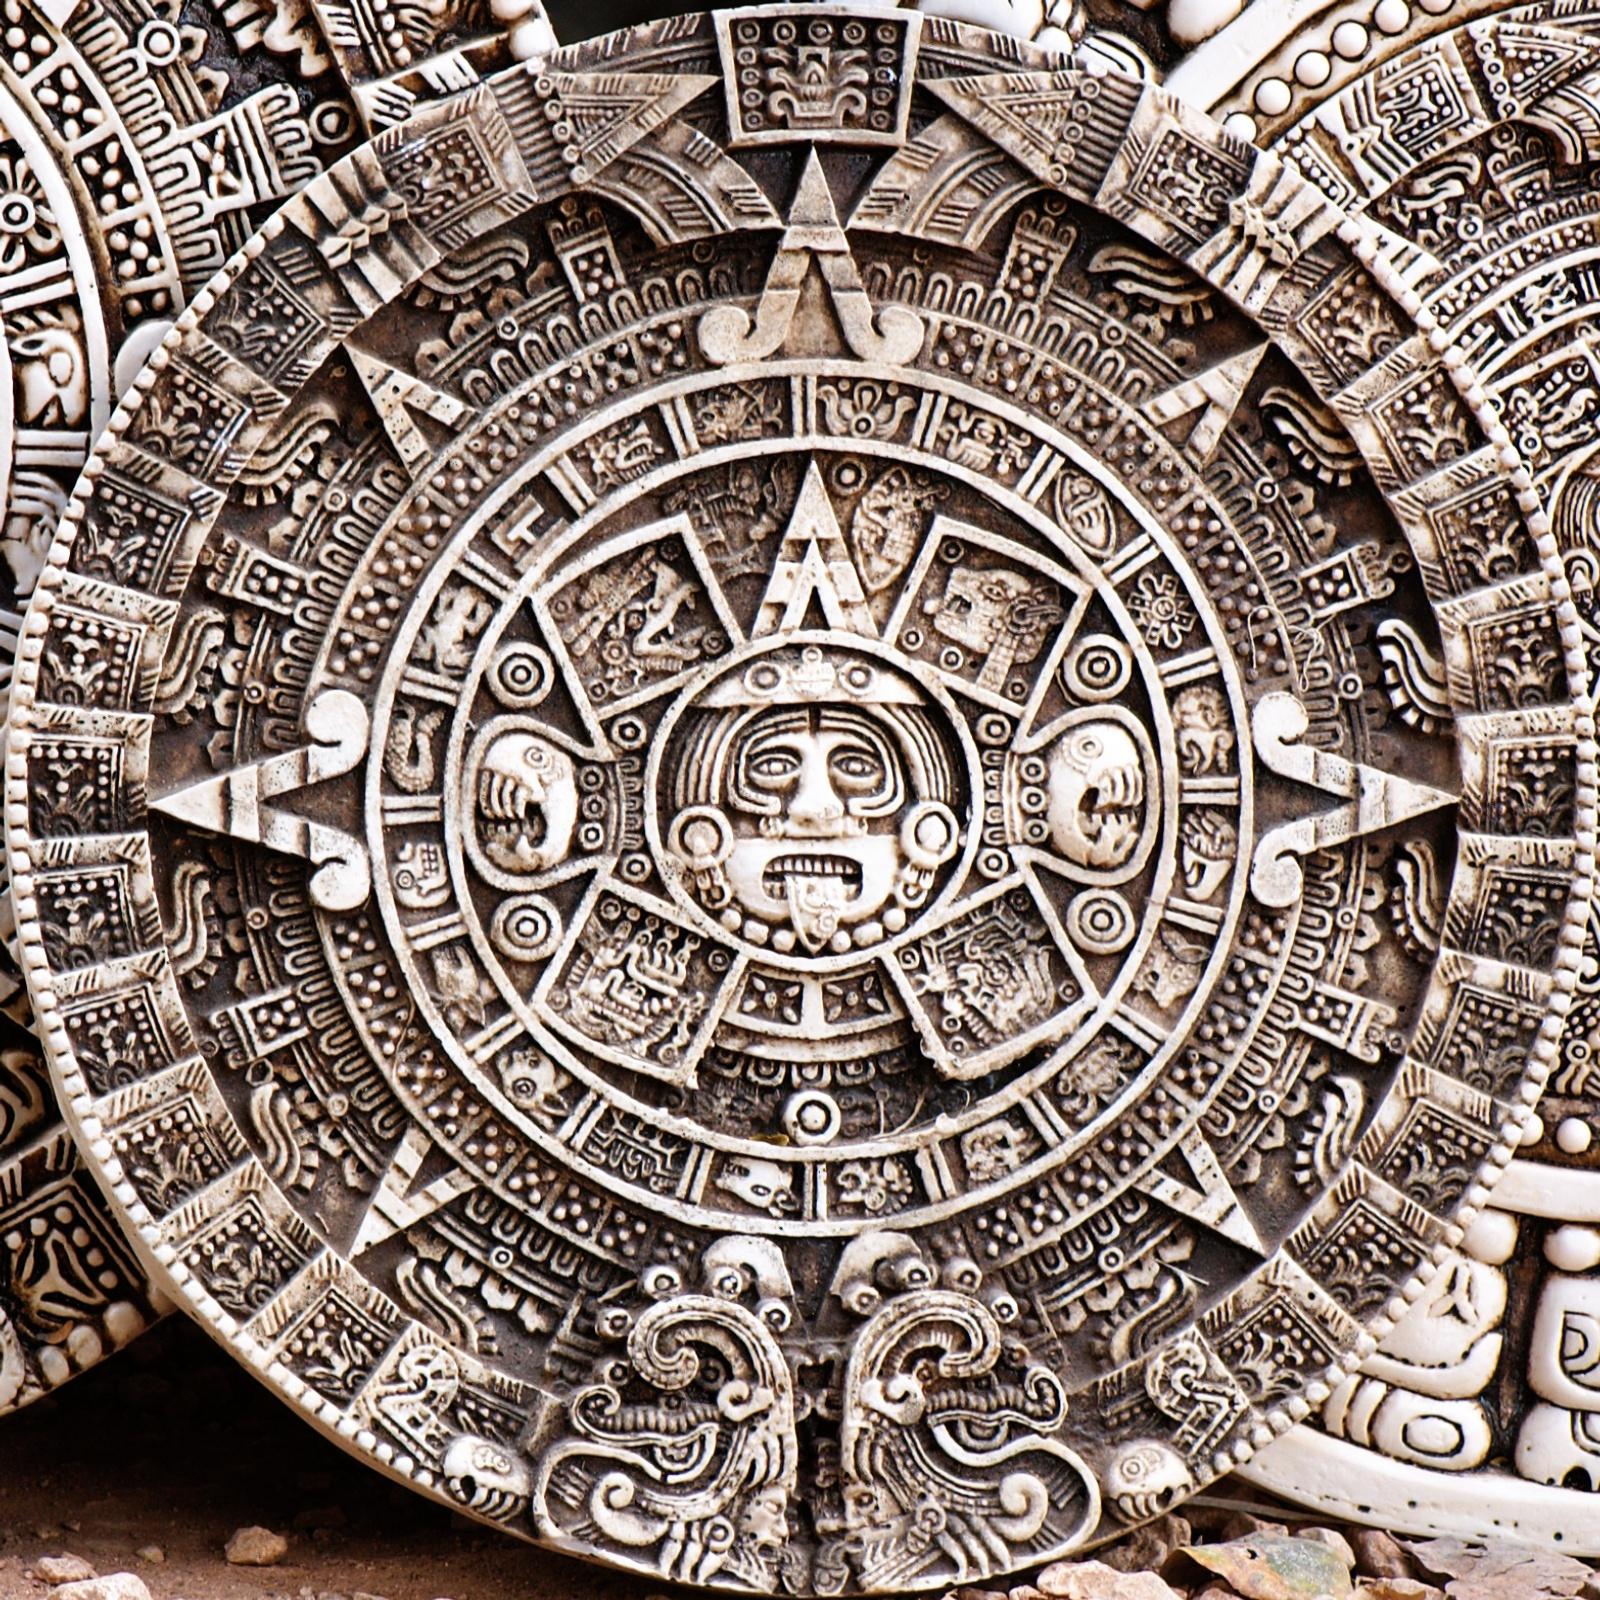 Quotidiano honebu di storia e archeologia i calendari for Arquitectura y arte de los mayas